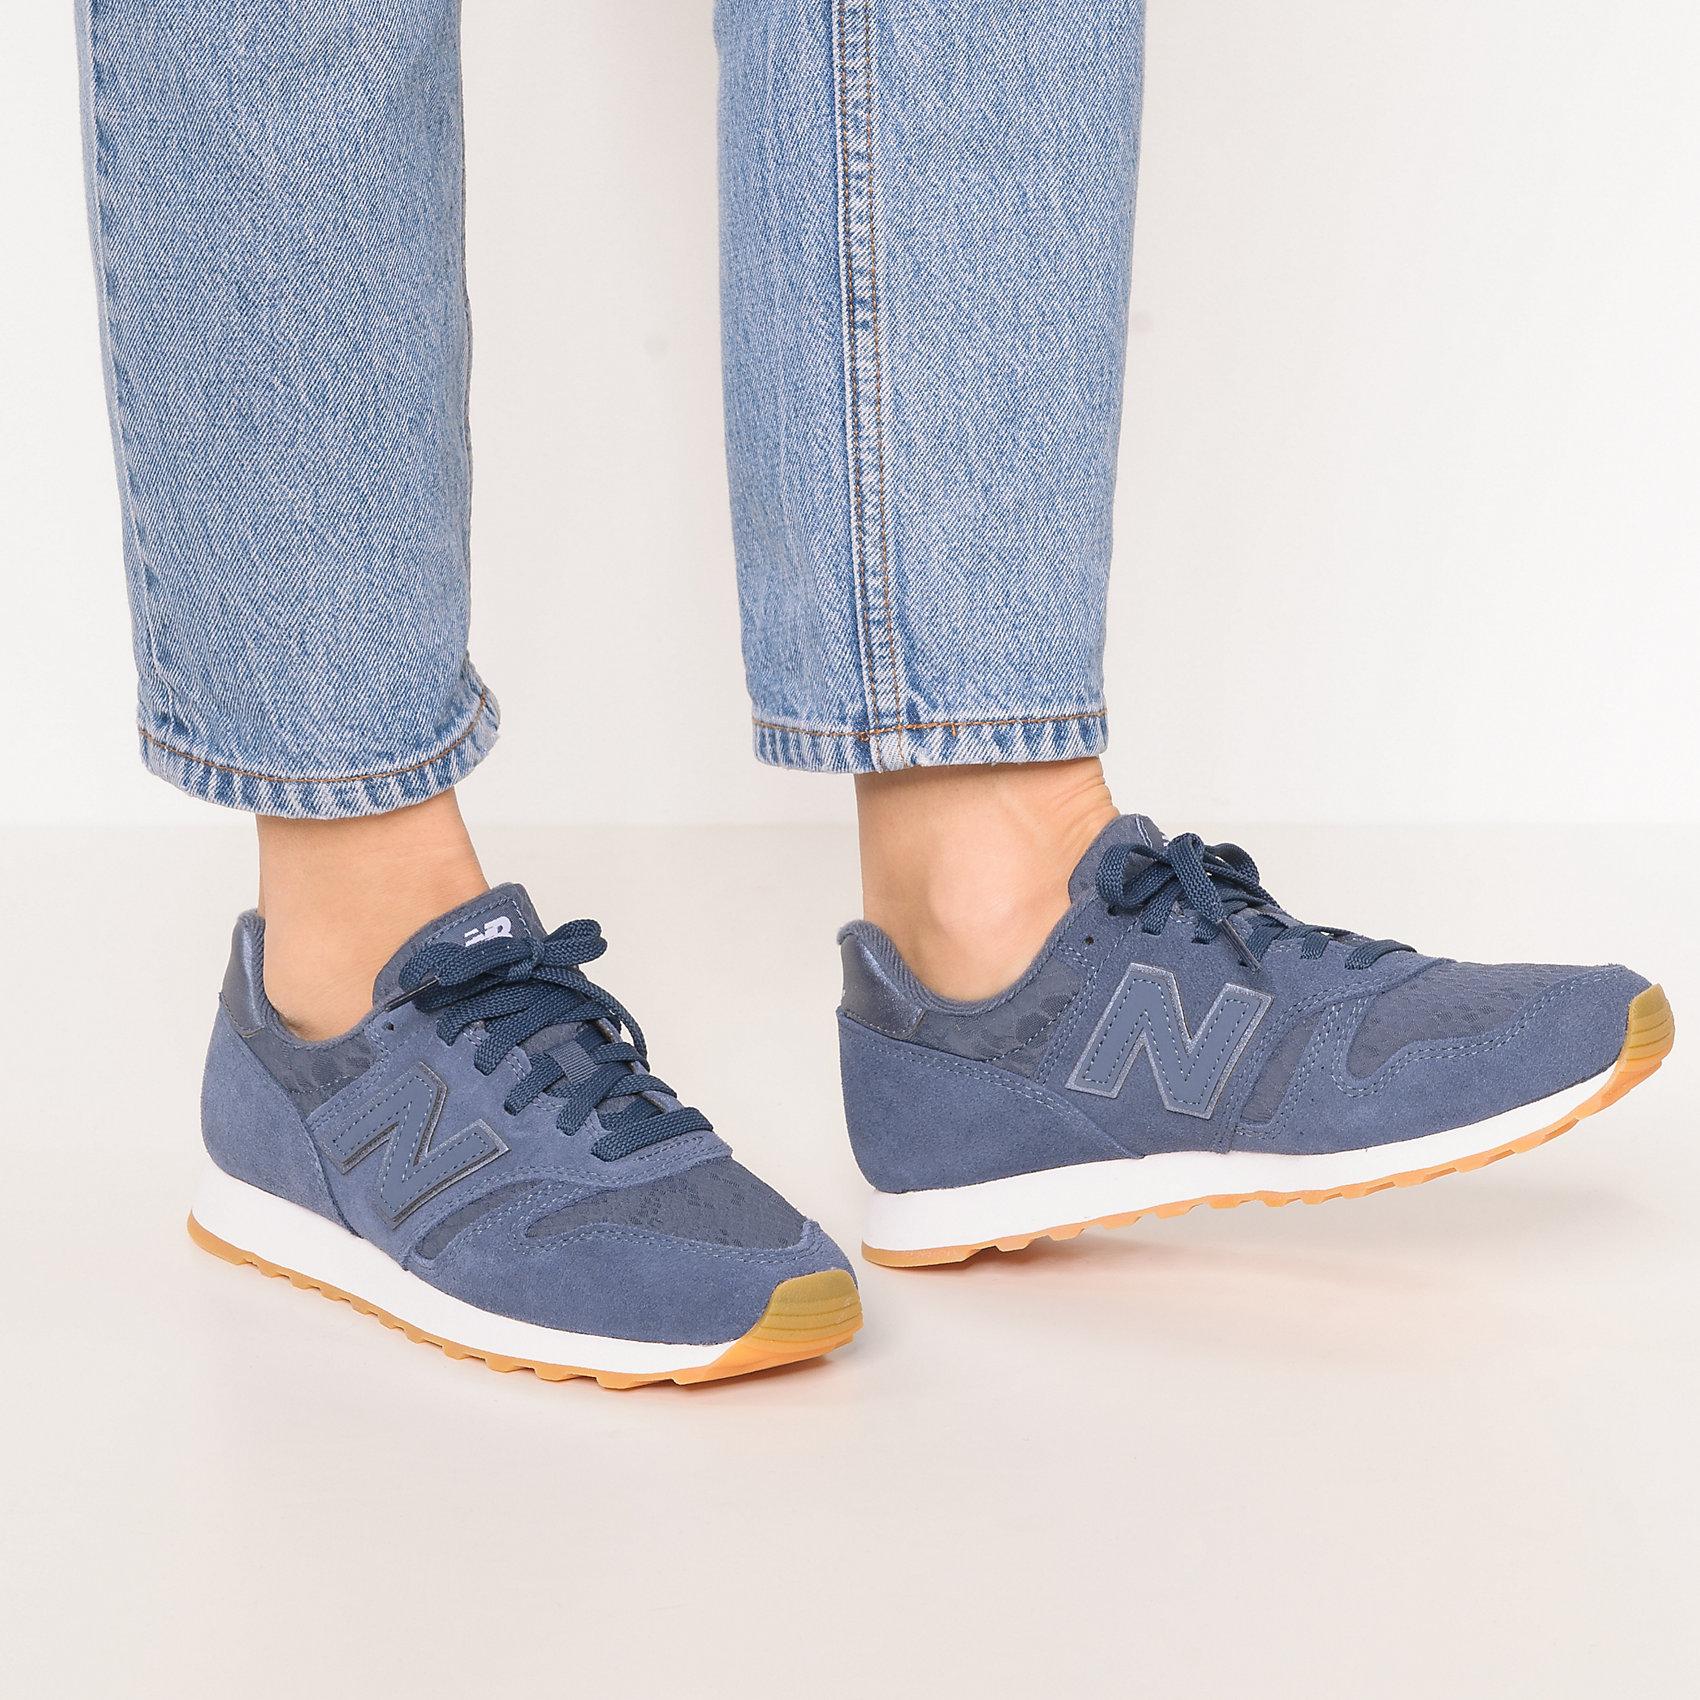 Details zu Neu new balance WL373 B Sneakers Low 7397813 für Damen rosa